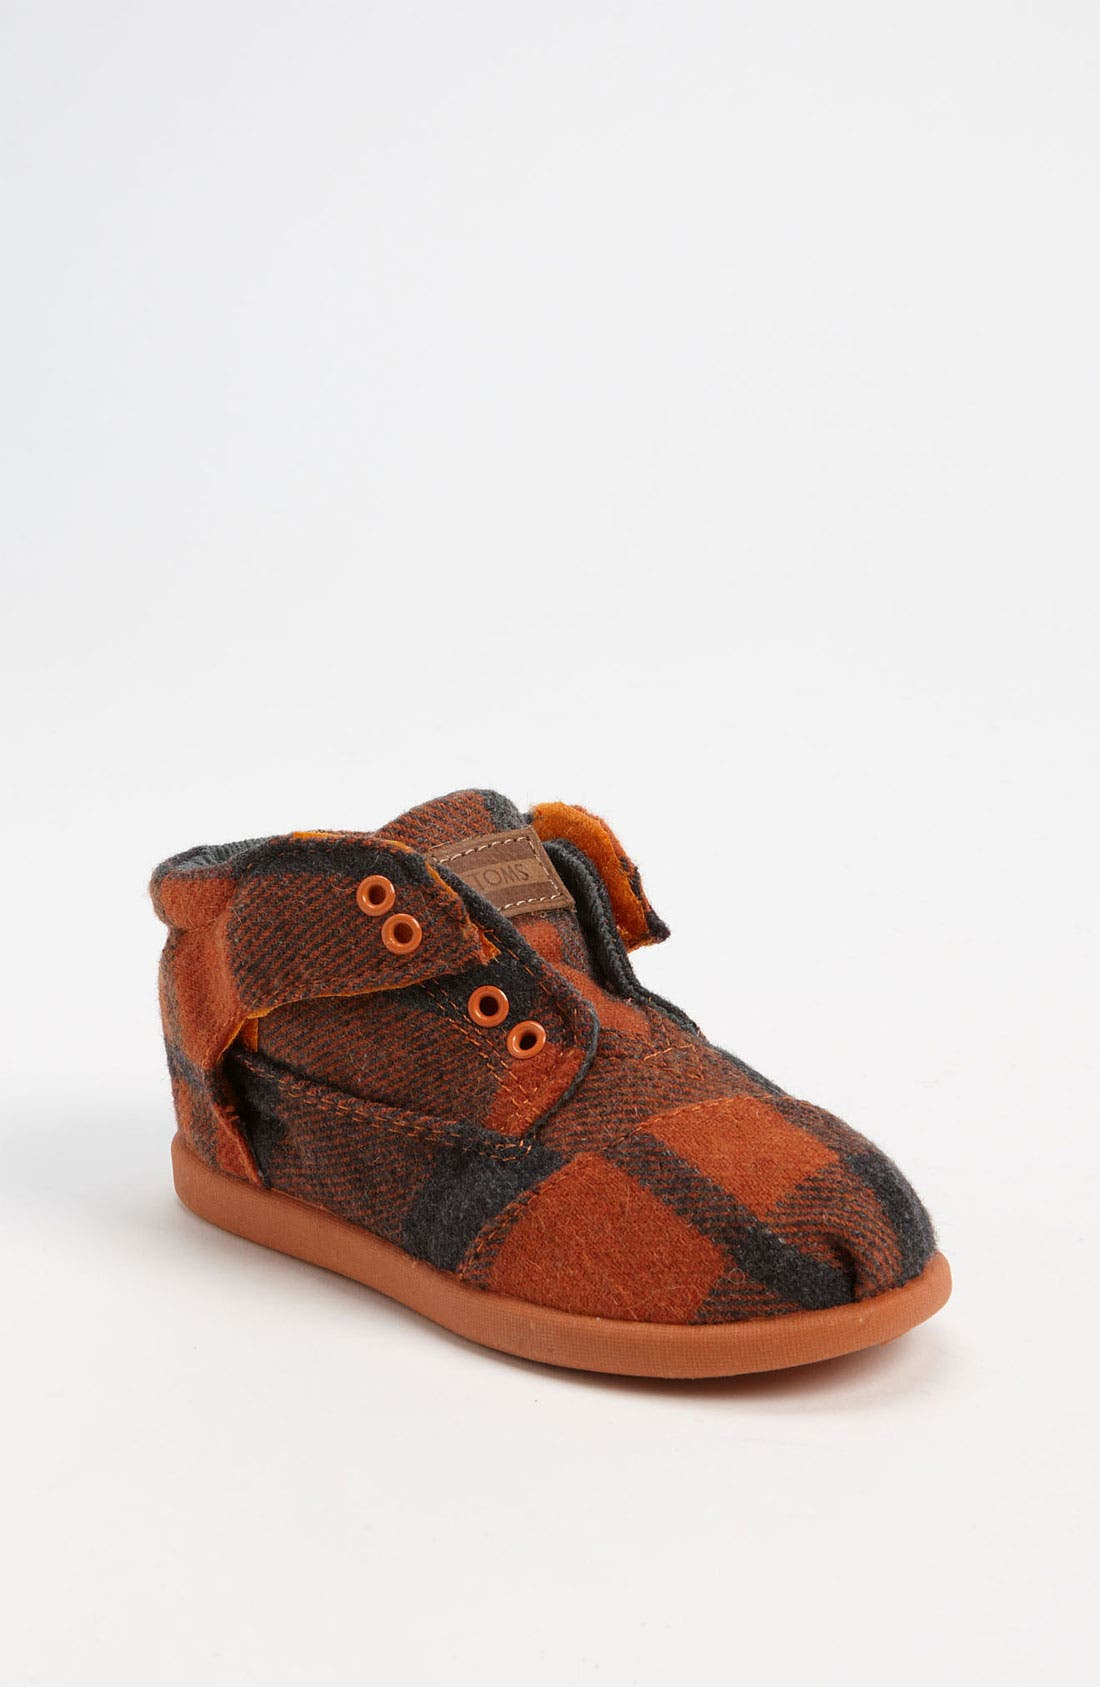 Alternate Image 1 Selected - TOMS 'Botas' Woolen Boot (Baby, Walker & Toddler)